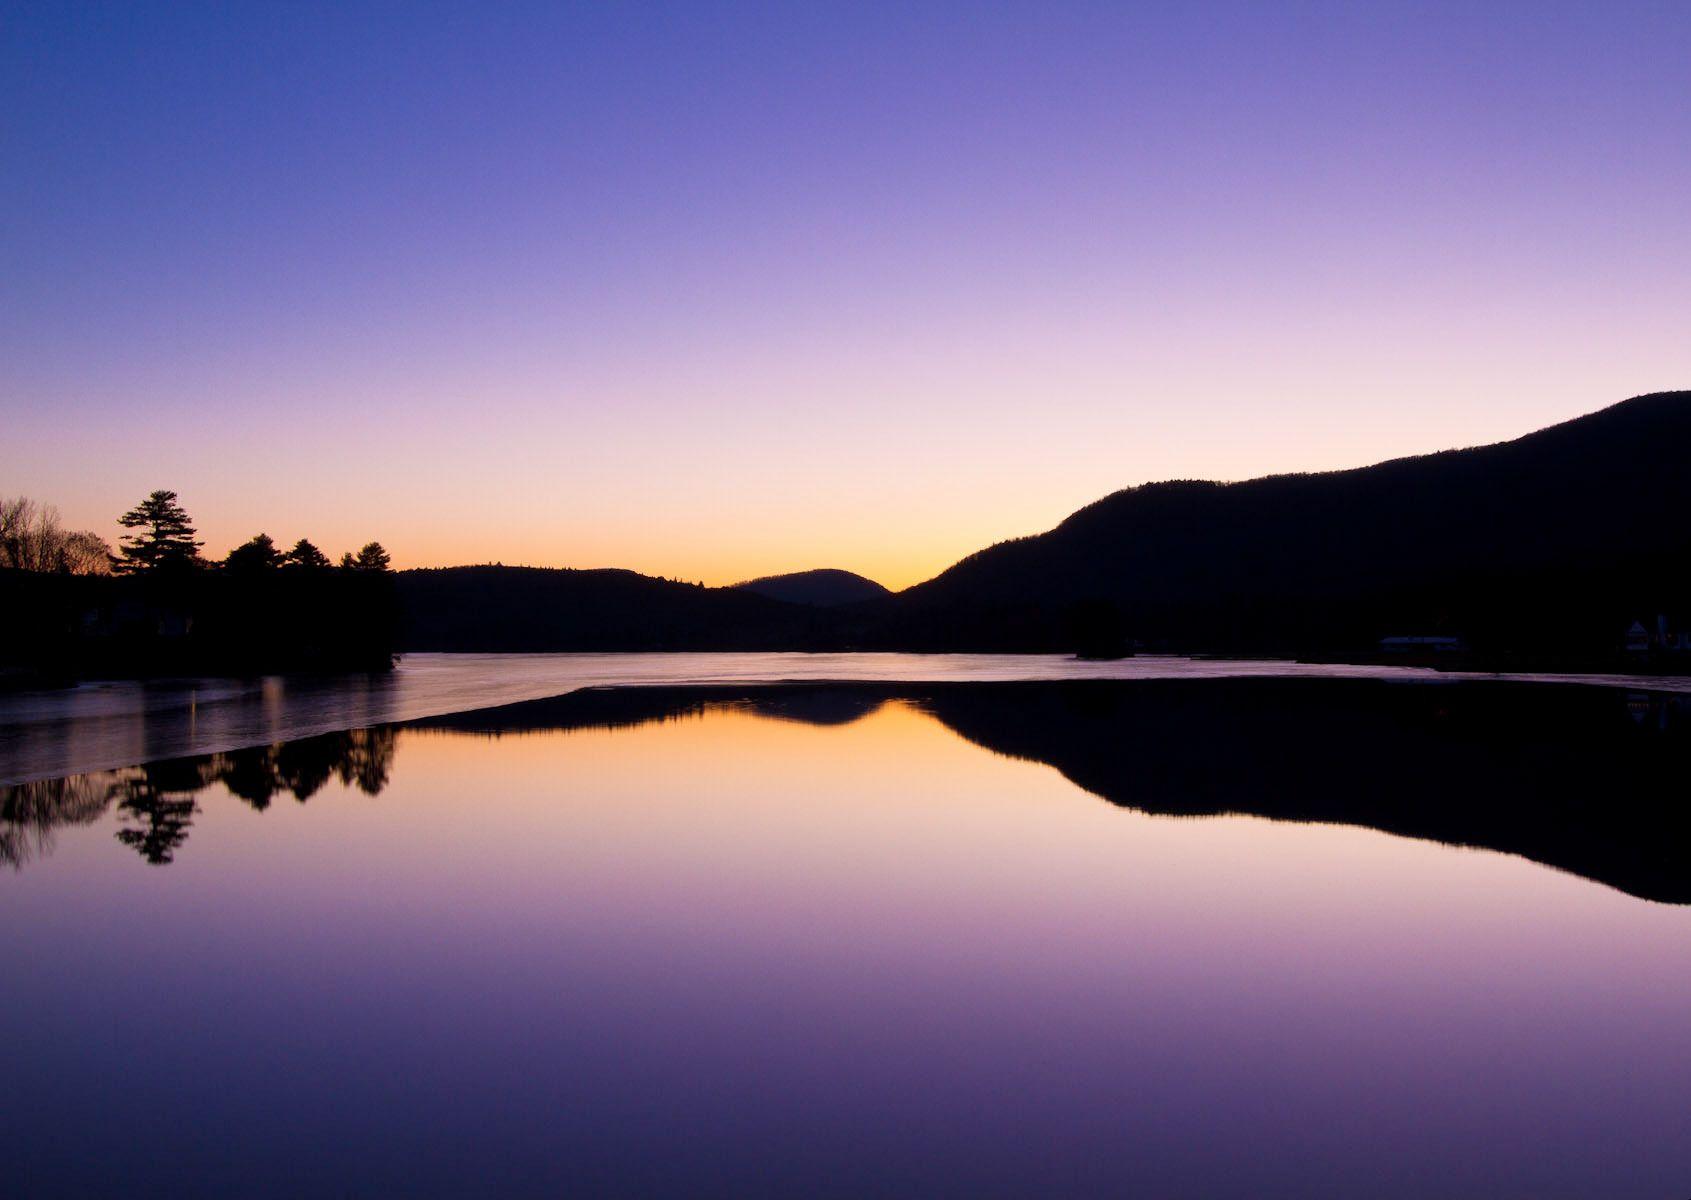 Lake Algonquin